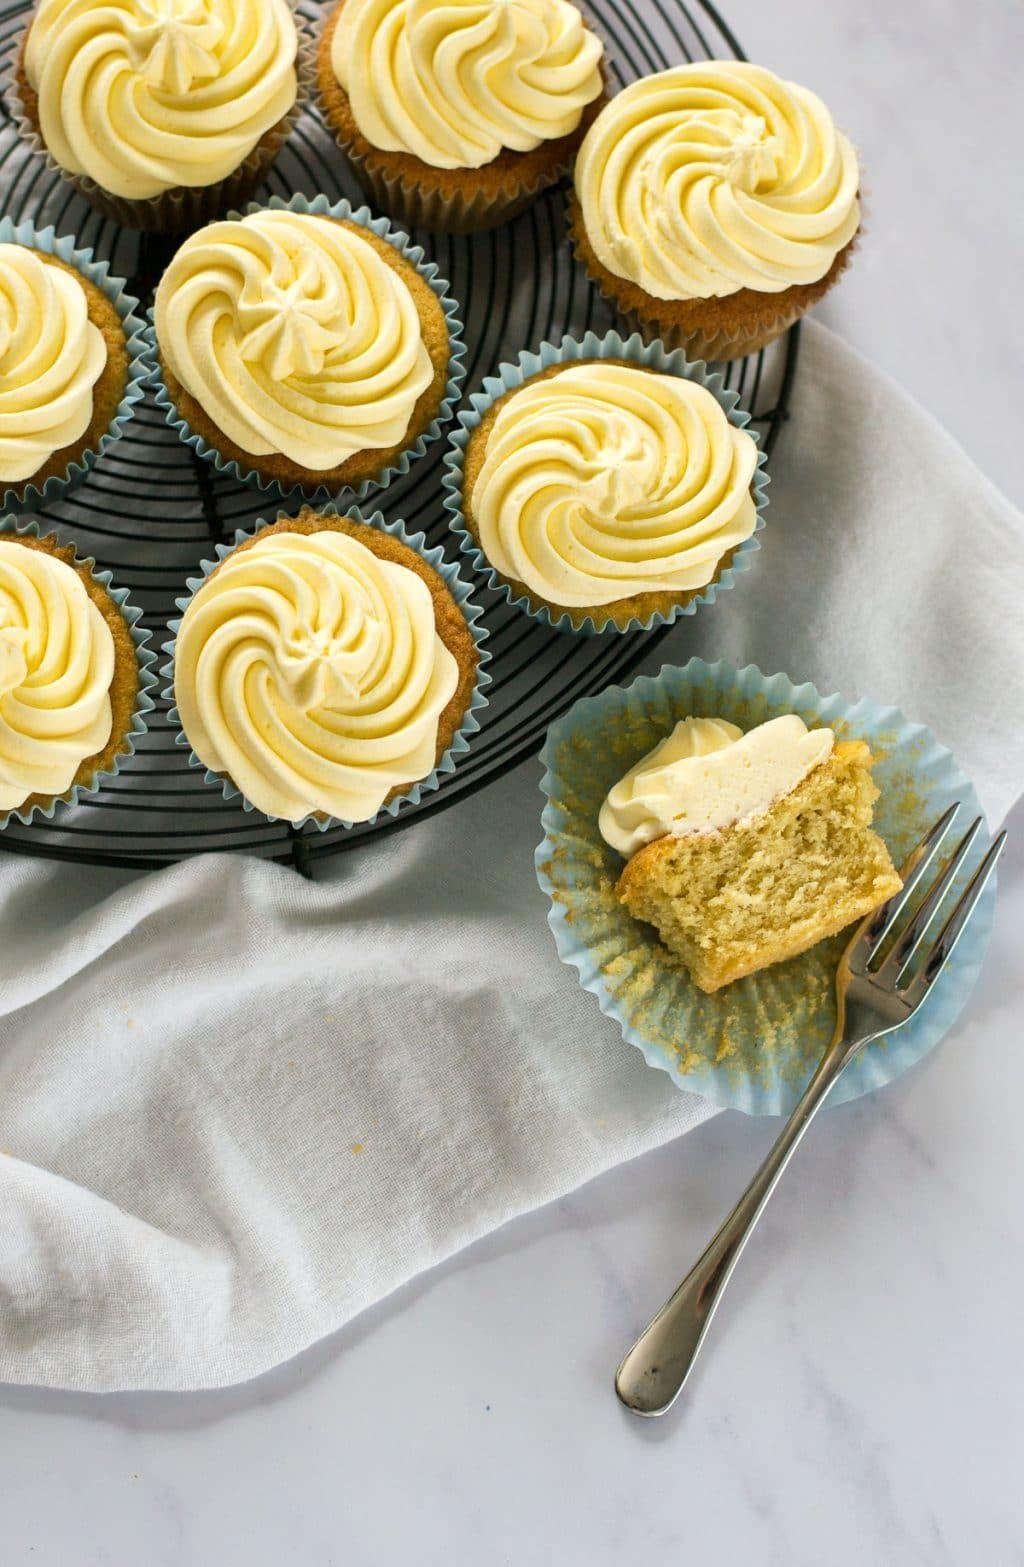 Vanilla Vegan Cupcakes Recipe | The Veg Space UK food blog ...